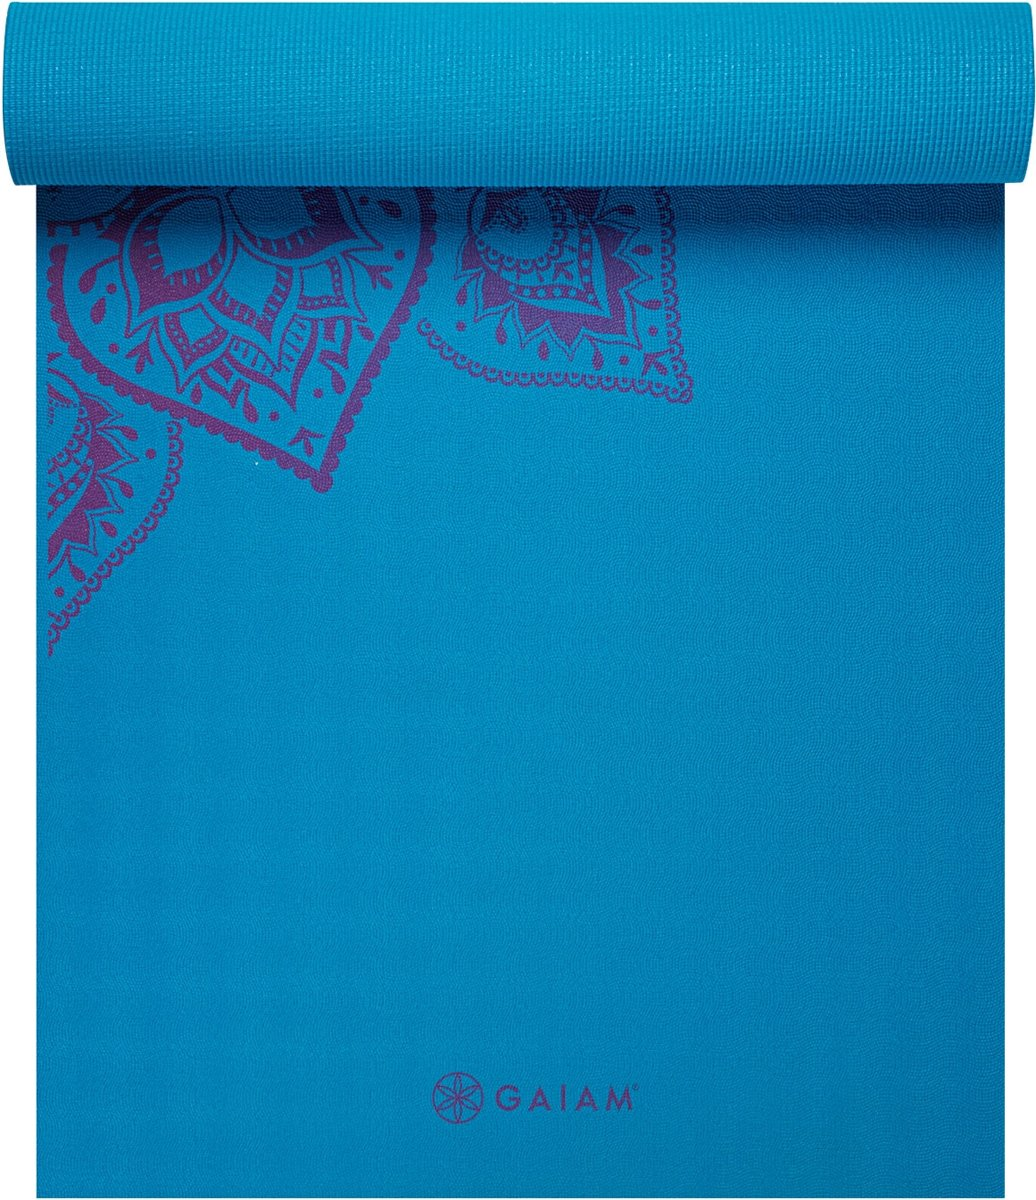 Gaiam Studio Select Mandala Sticky-grip - Yogamat - 5mm - Blauw